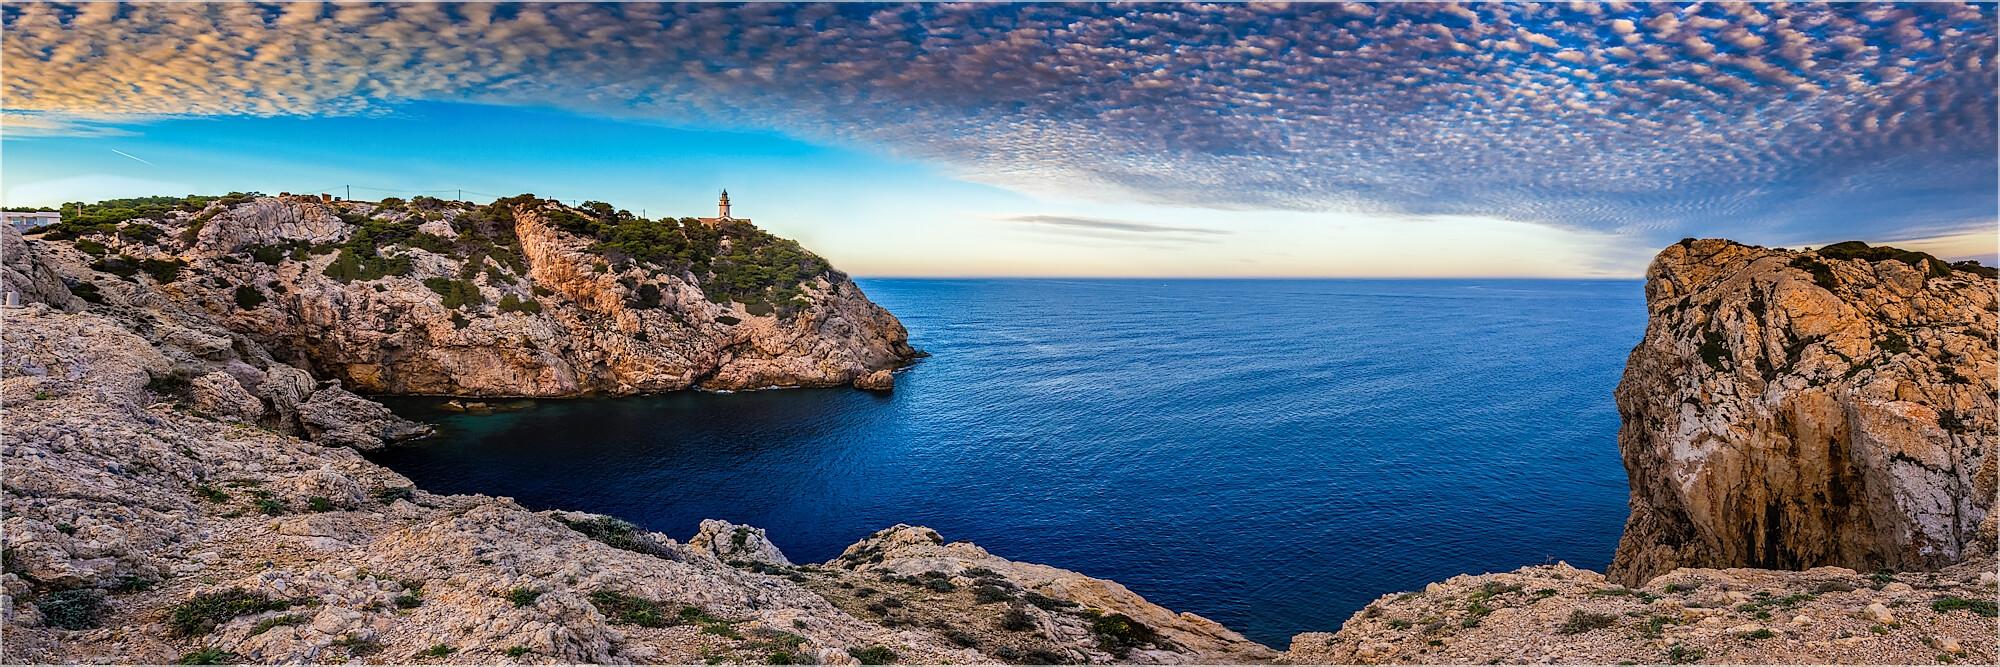 Panoramafoto Leuchtturm bei Cala Rajada Mallorca